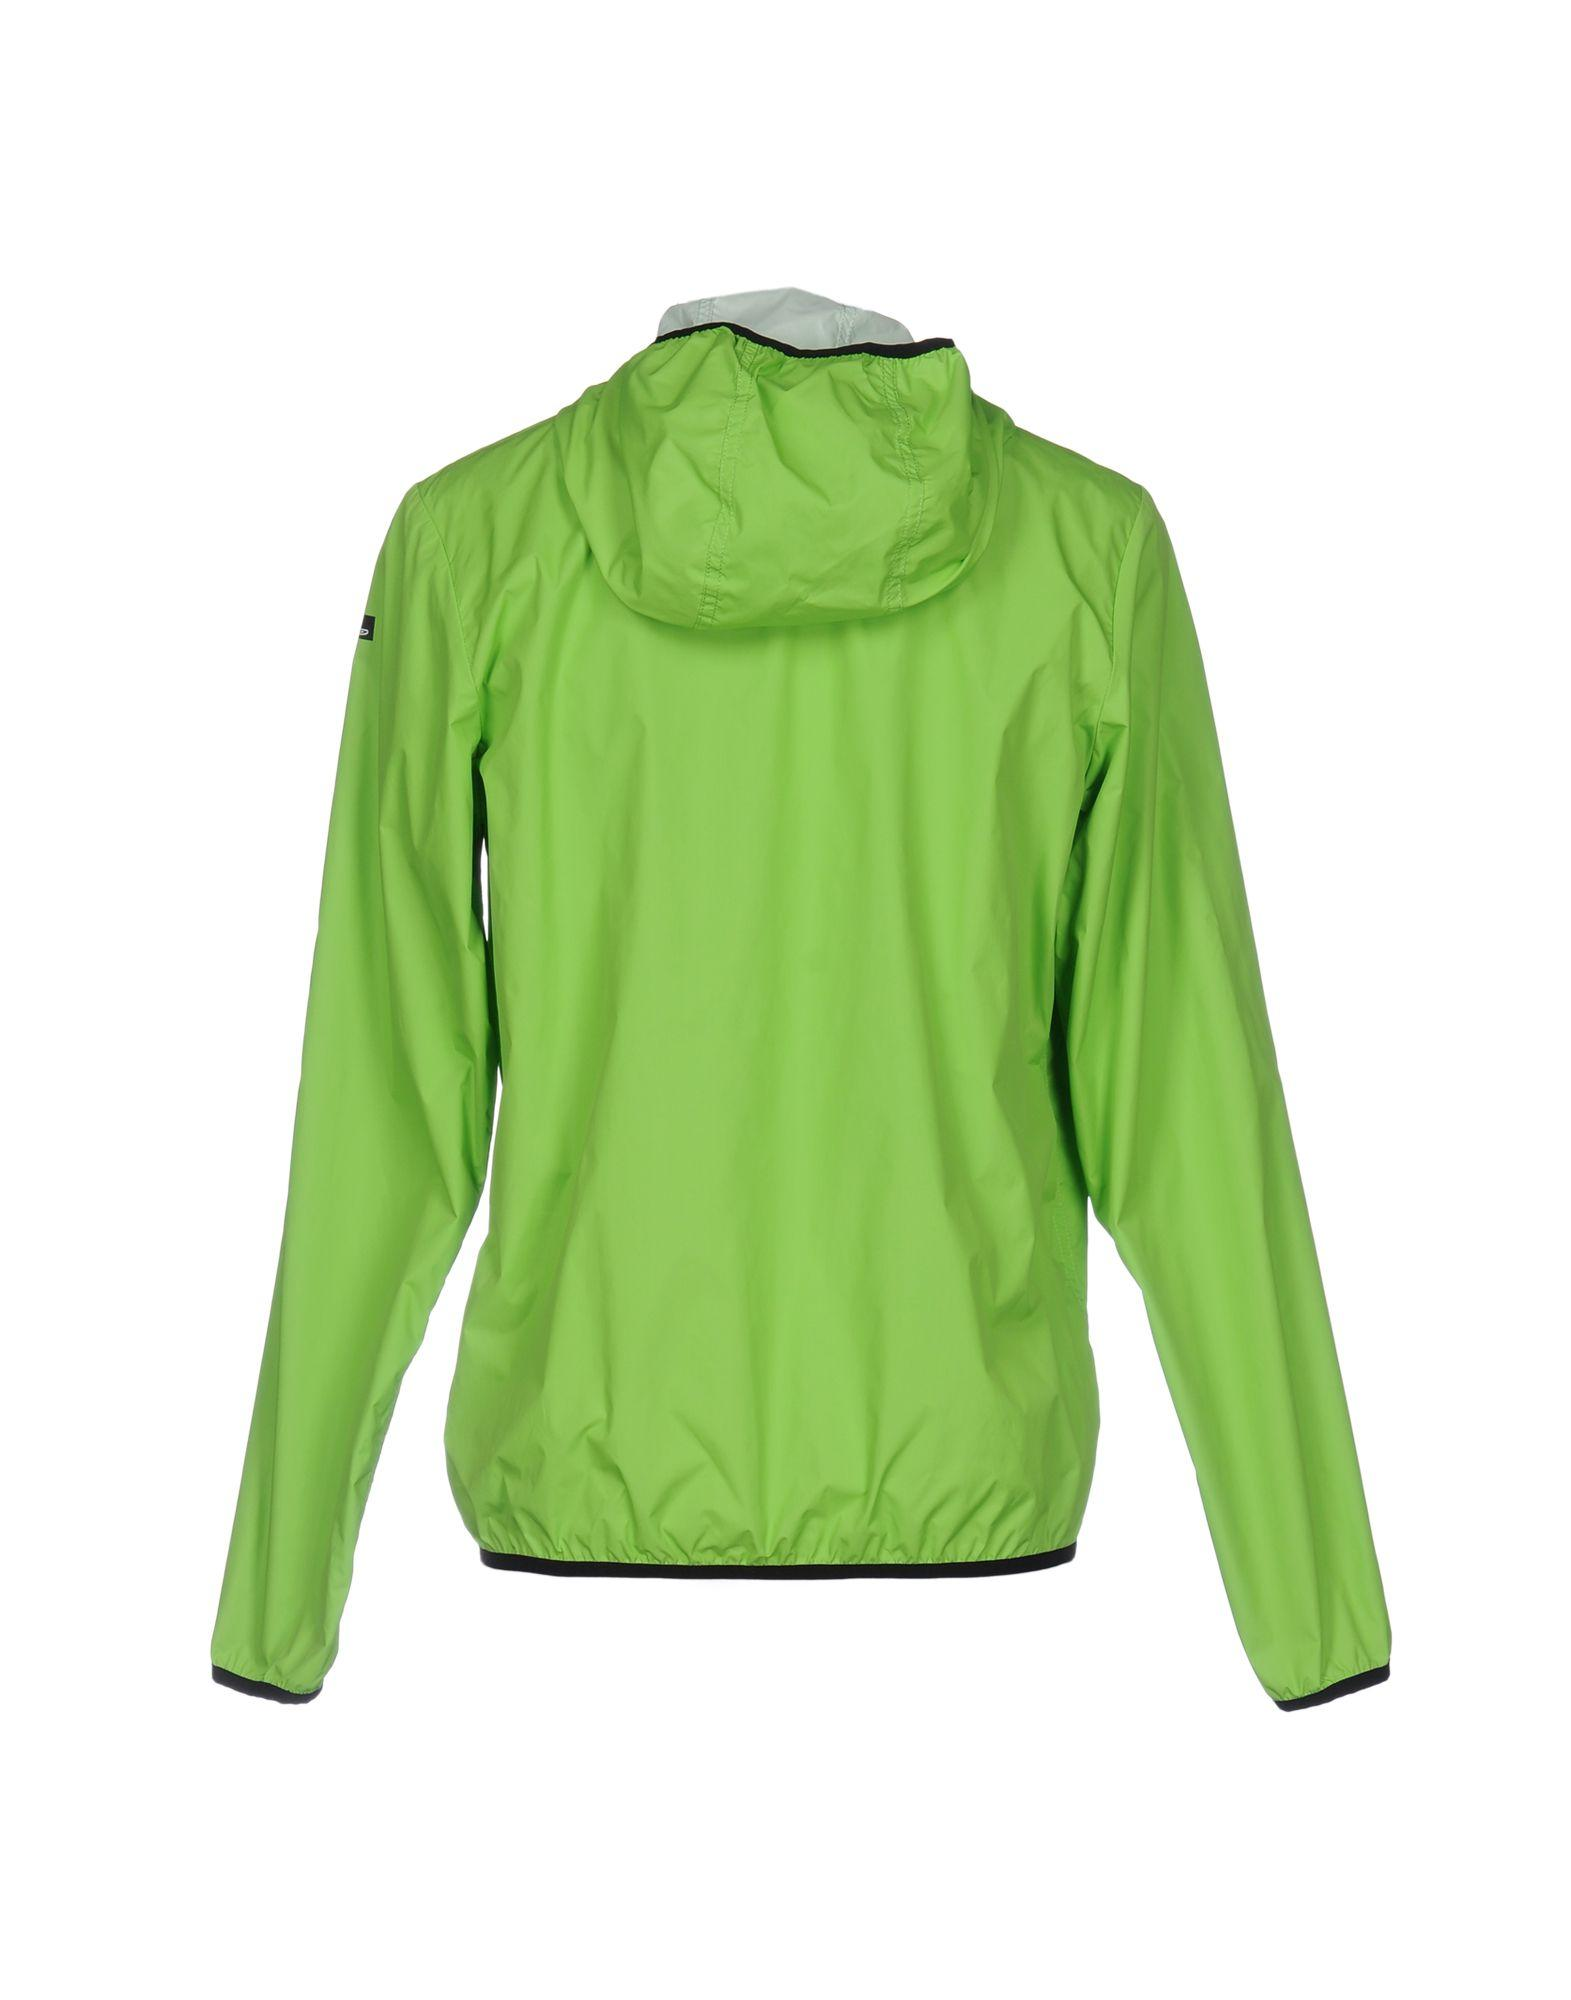 Rrd Synthetic Jacket in Acid Green (Green) for Men